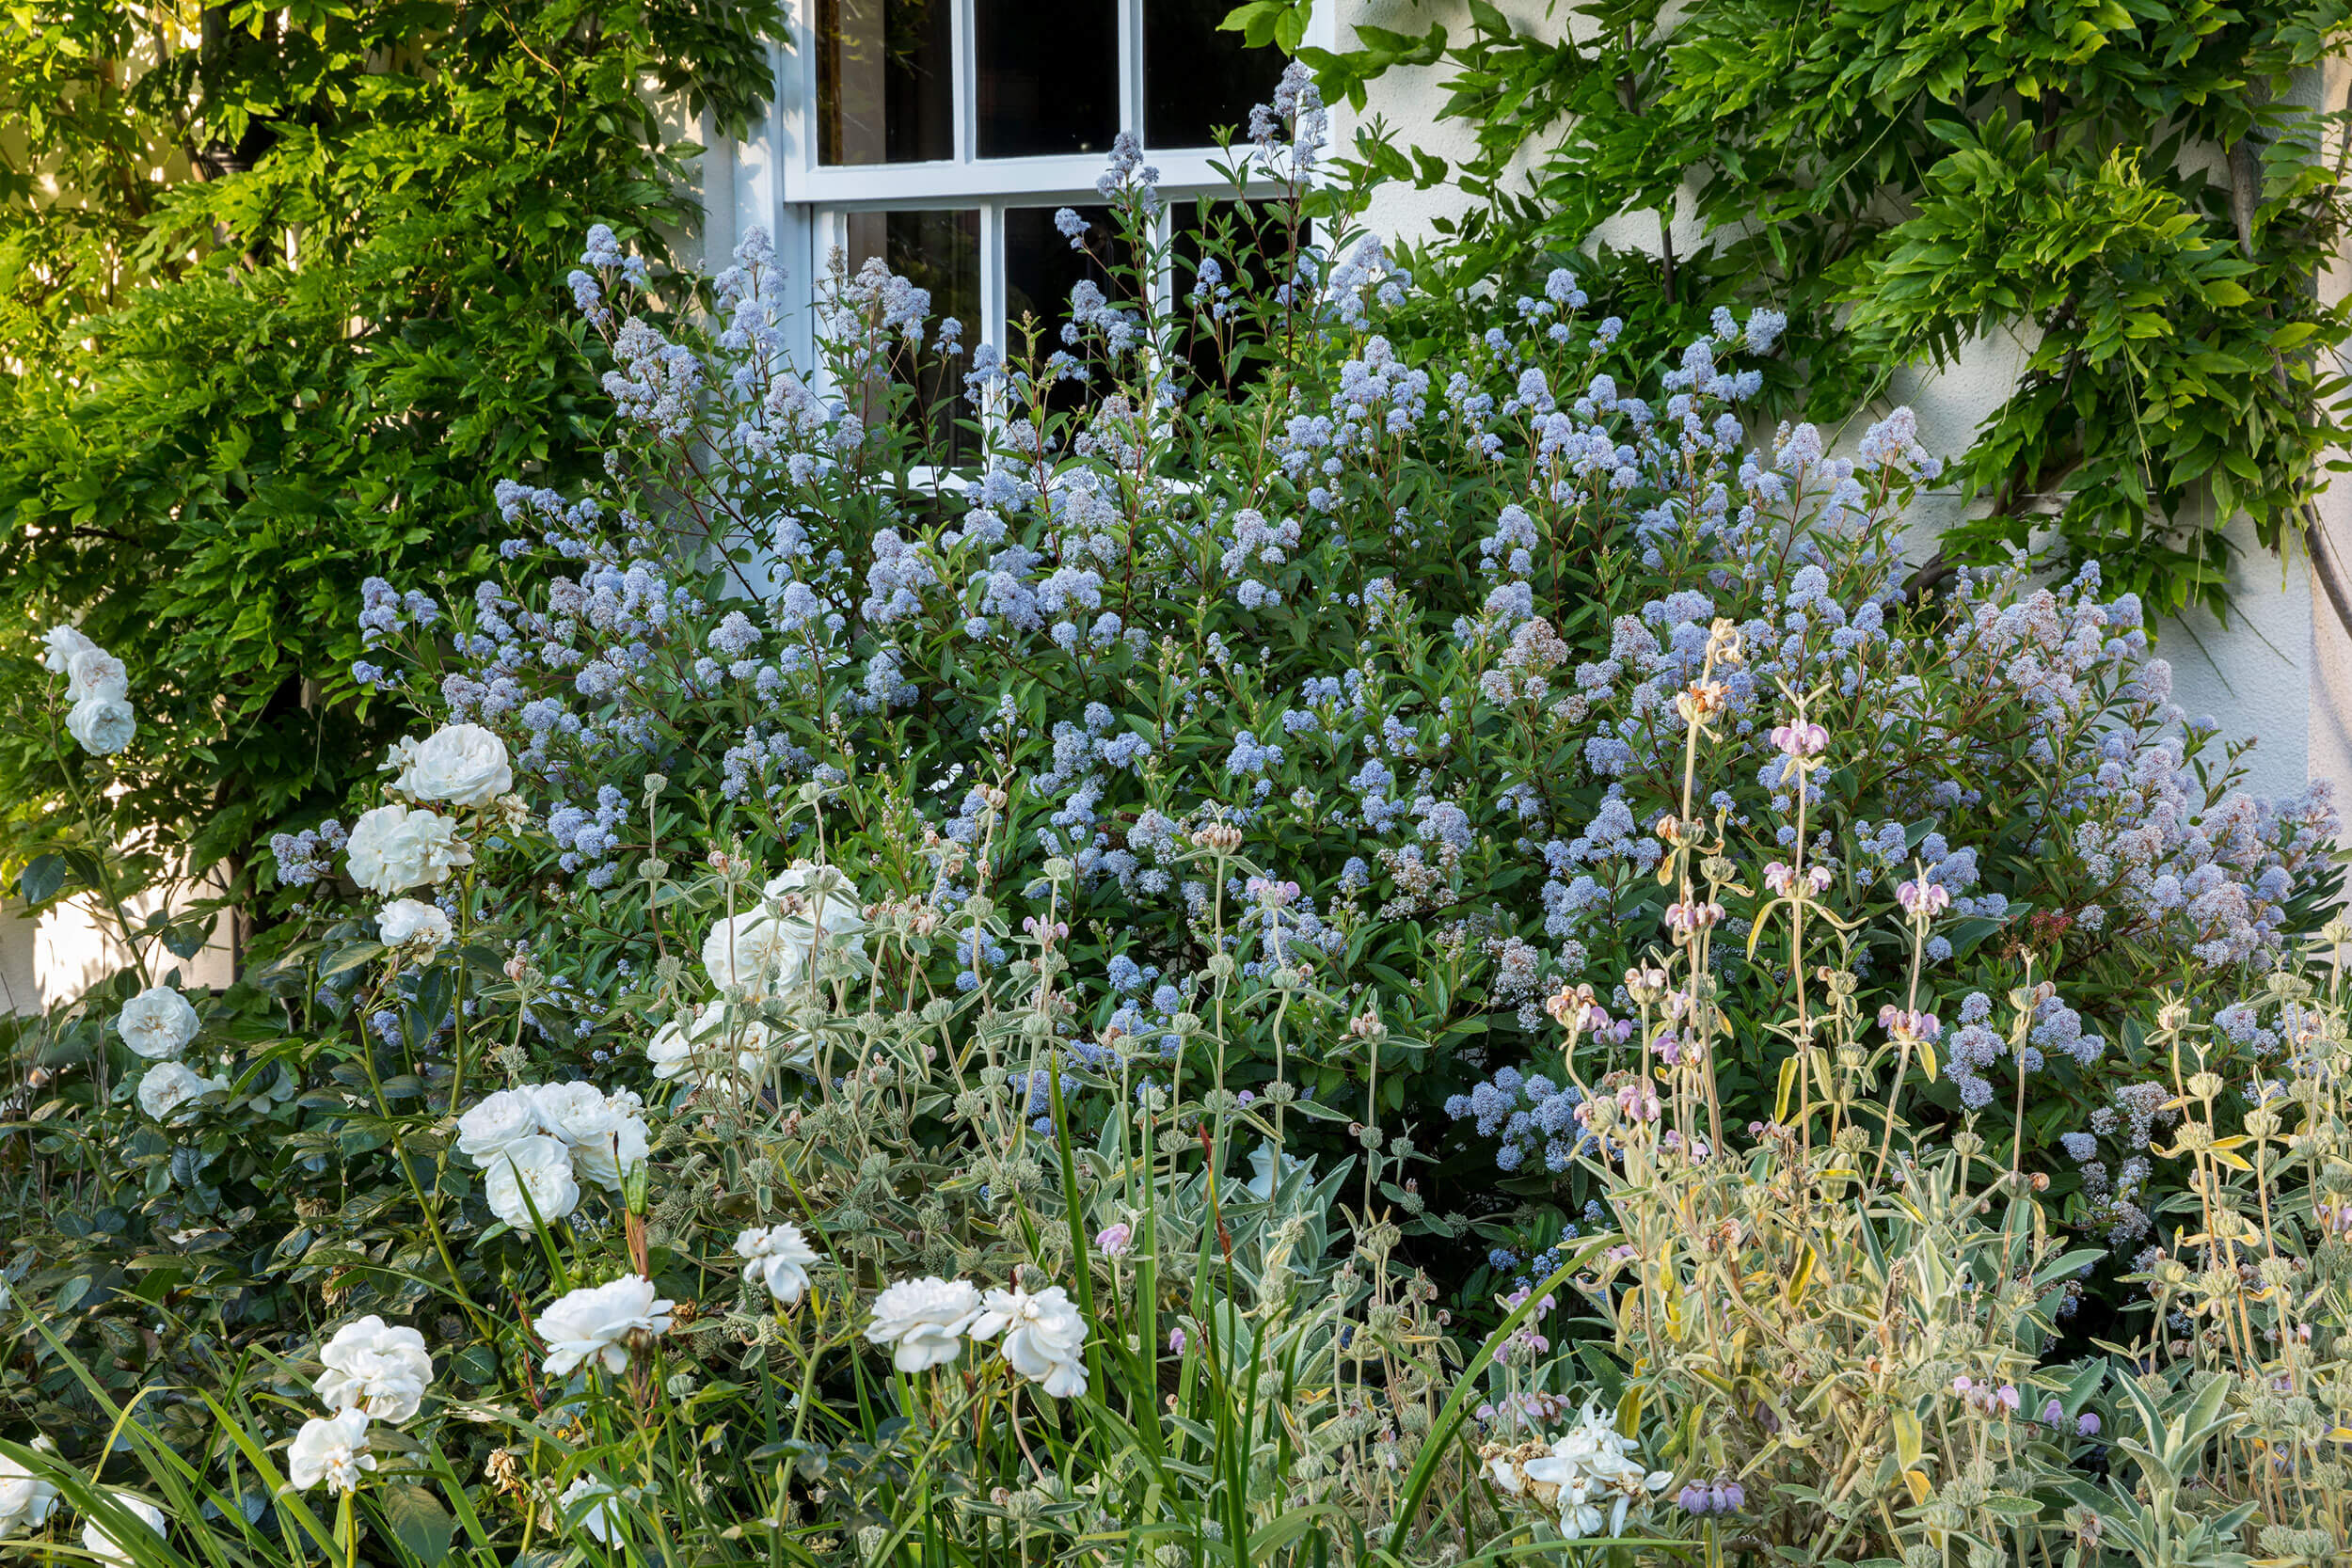 Garden in Isle of Wight